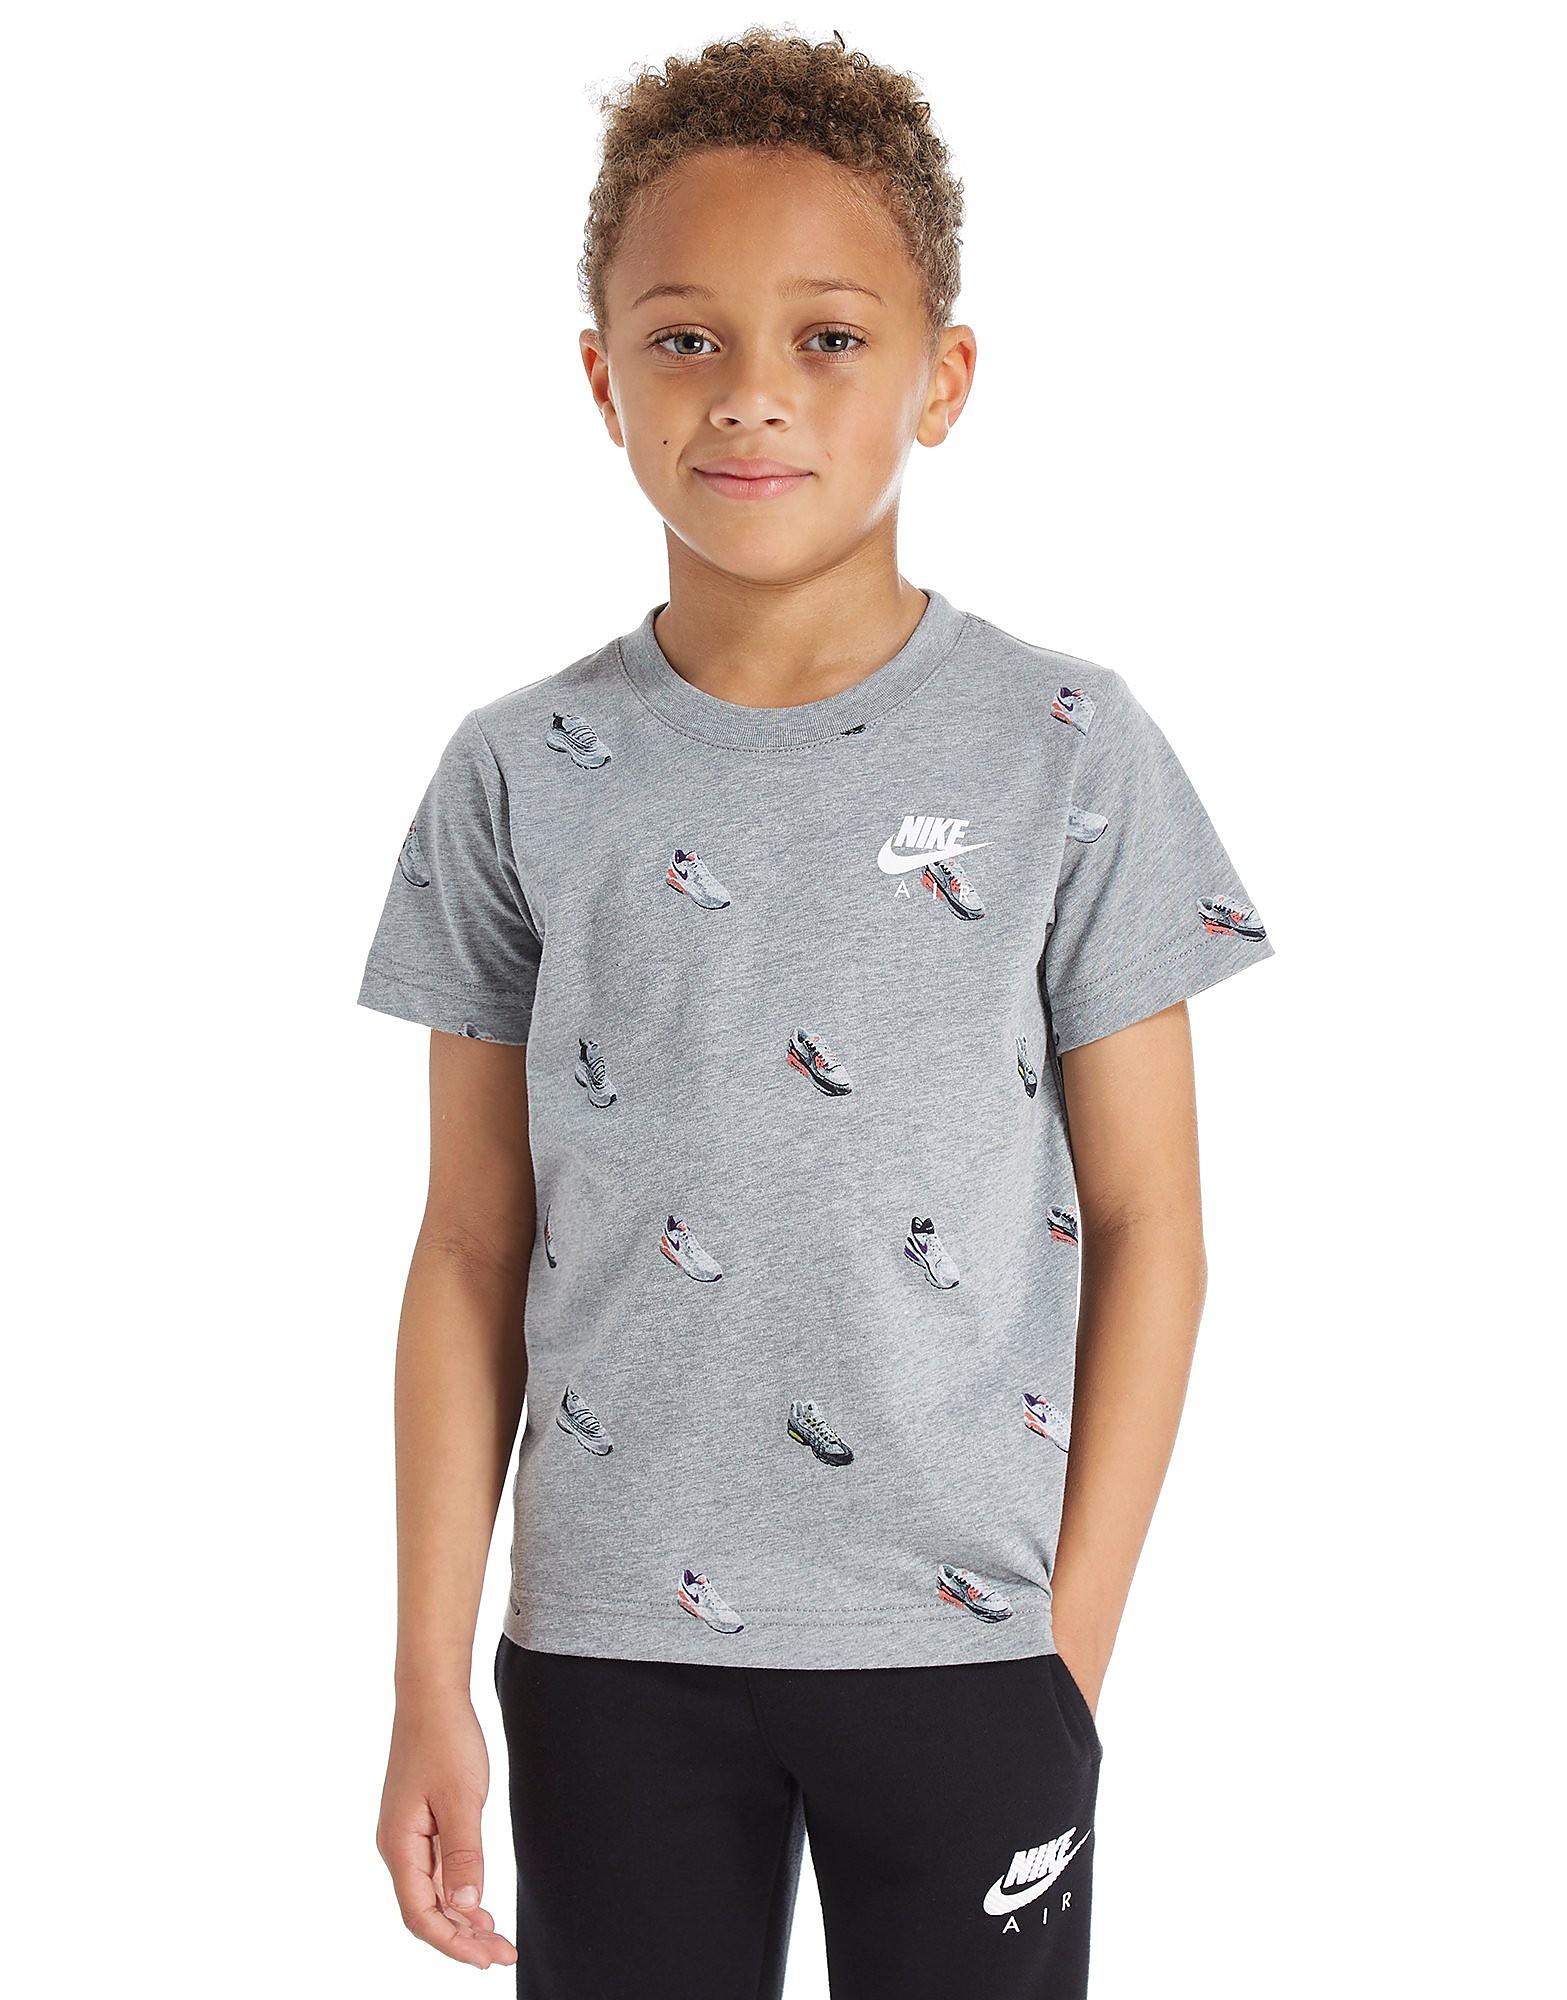 Nike Air Shoe Print T-Shirt Children